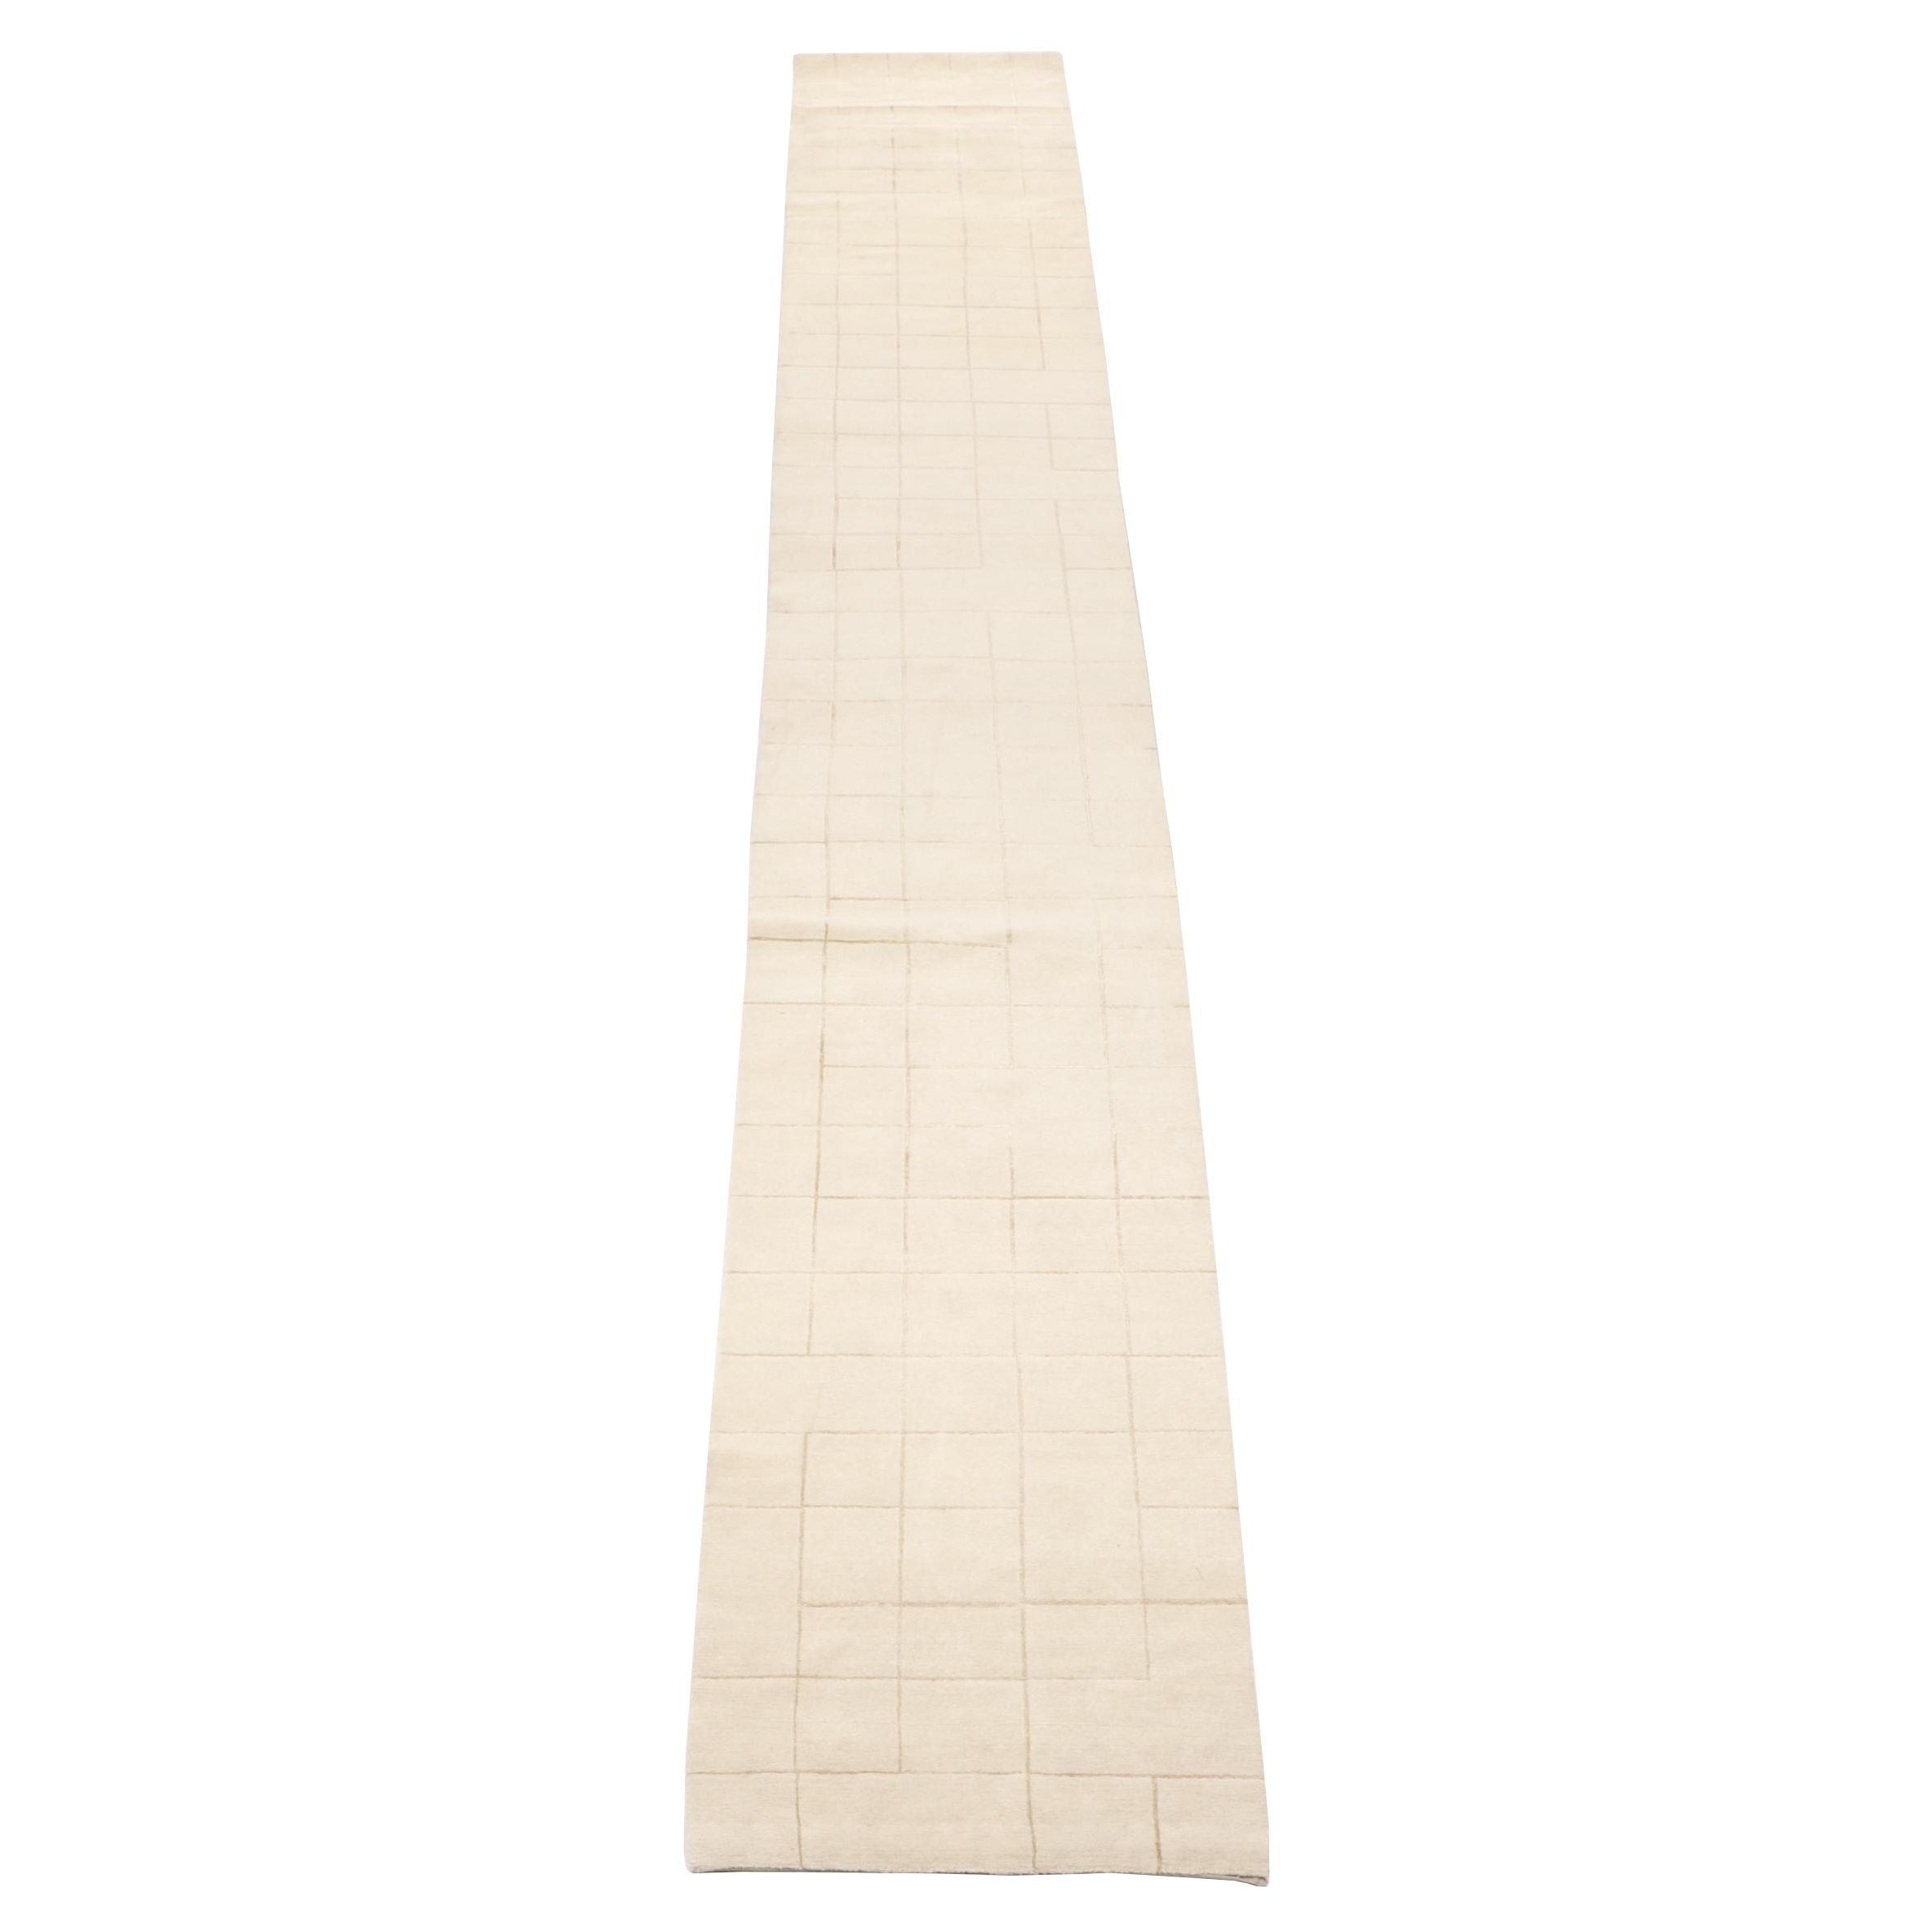 Hand-Knotted Warp & Weft Nepalese Bamboo Silk Carpet Runner